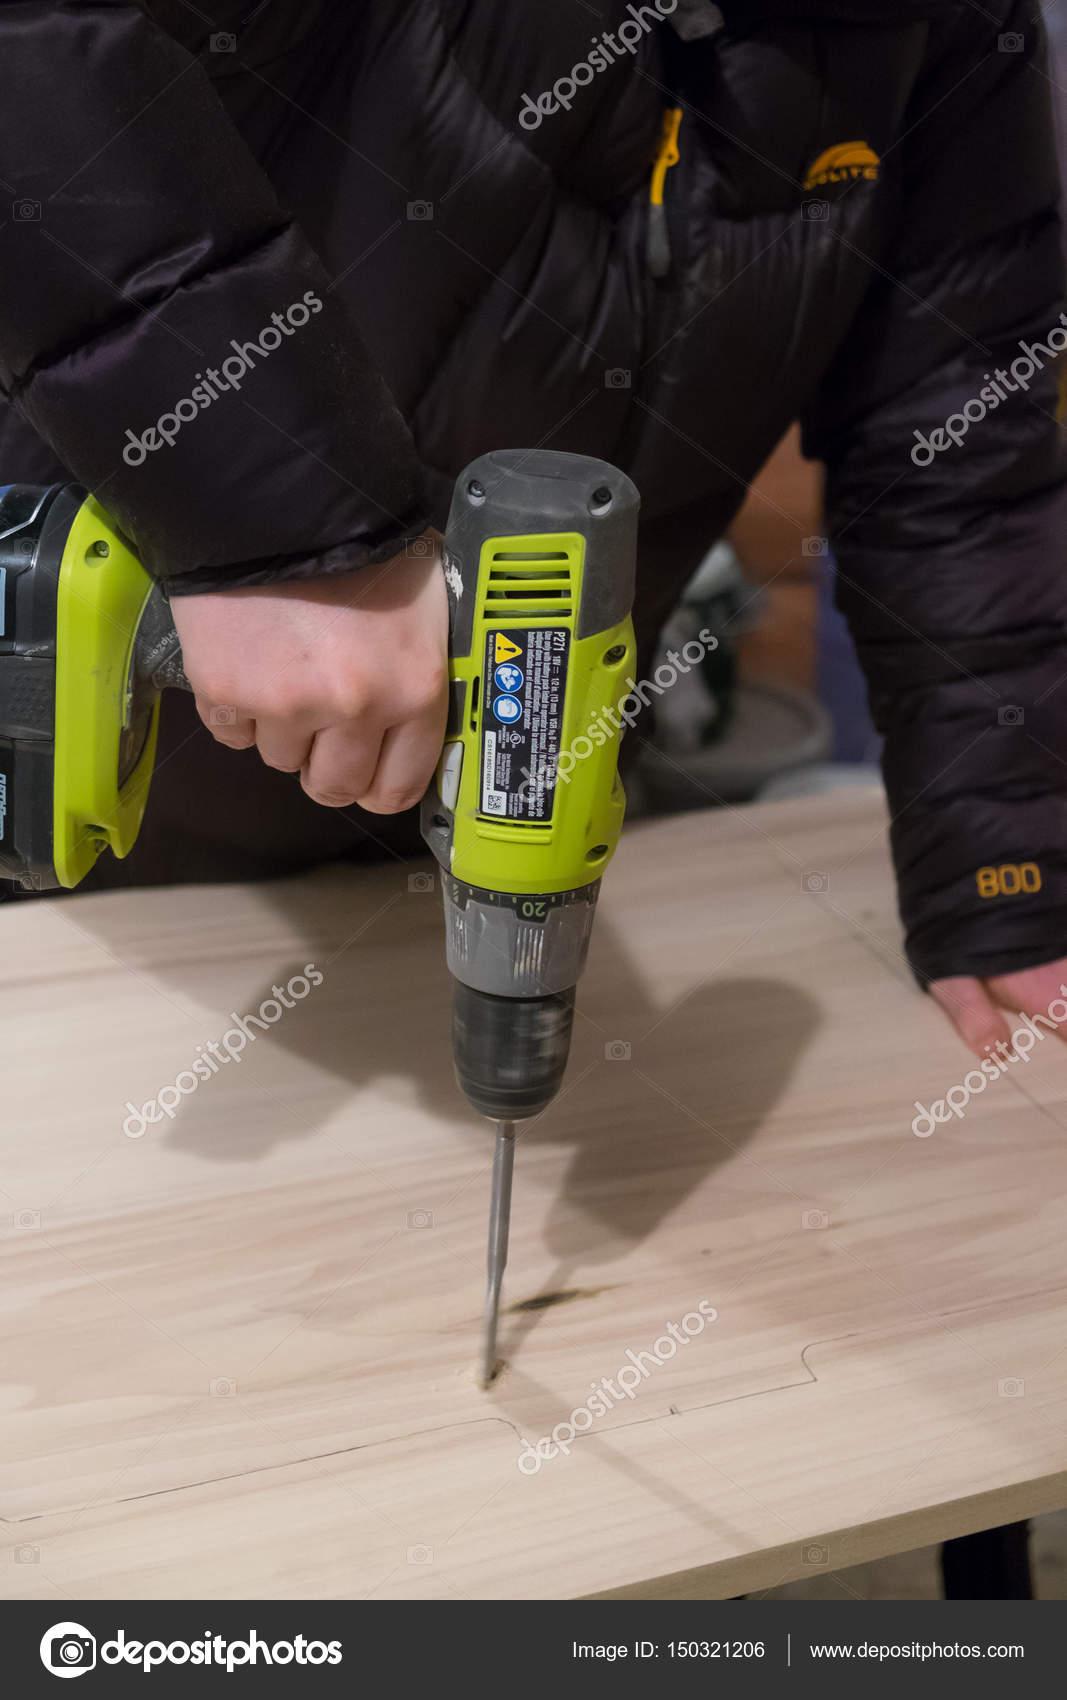 ryobi bohrer-treiber-tool — redaktionelles stockfoto © joshuarainey